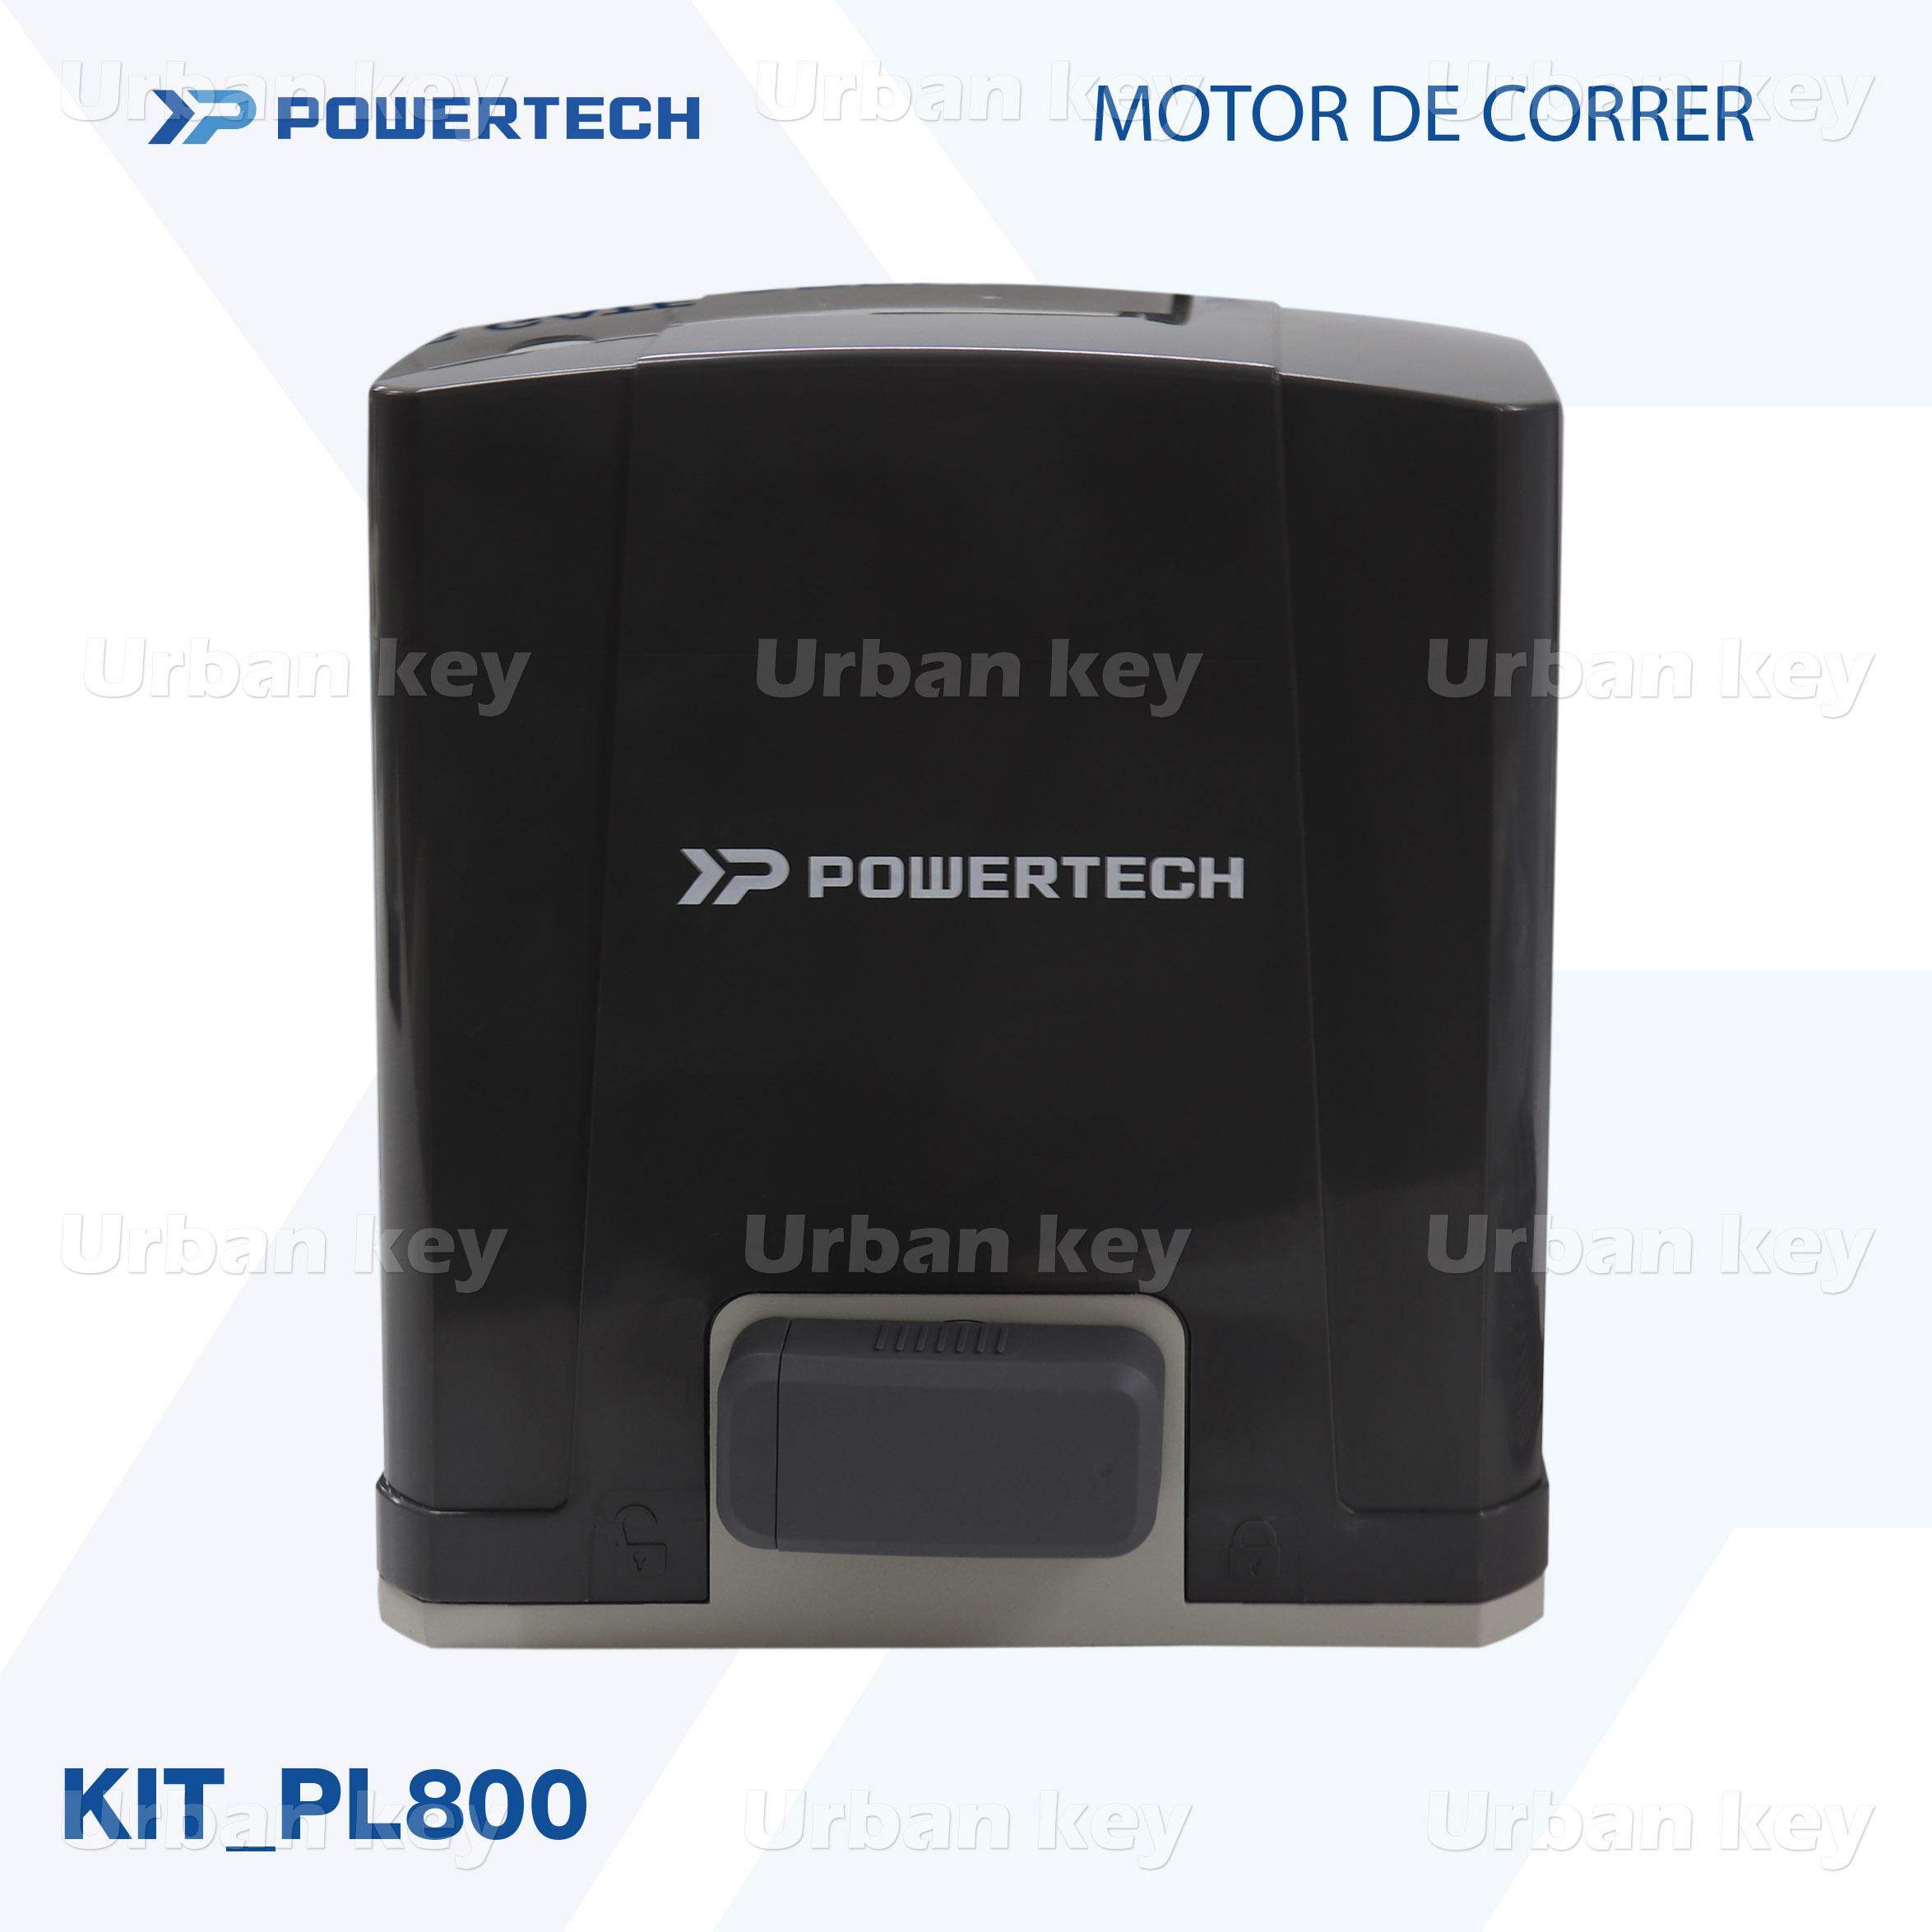 KIT MOTOR DE CORRER  PL800_DC POWERTECH